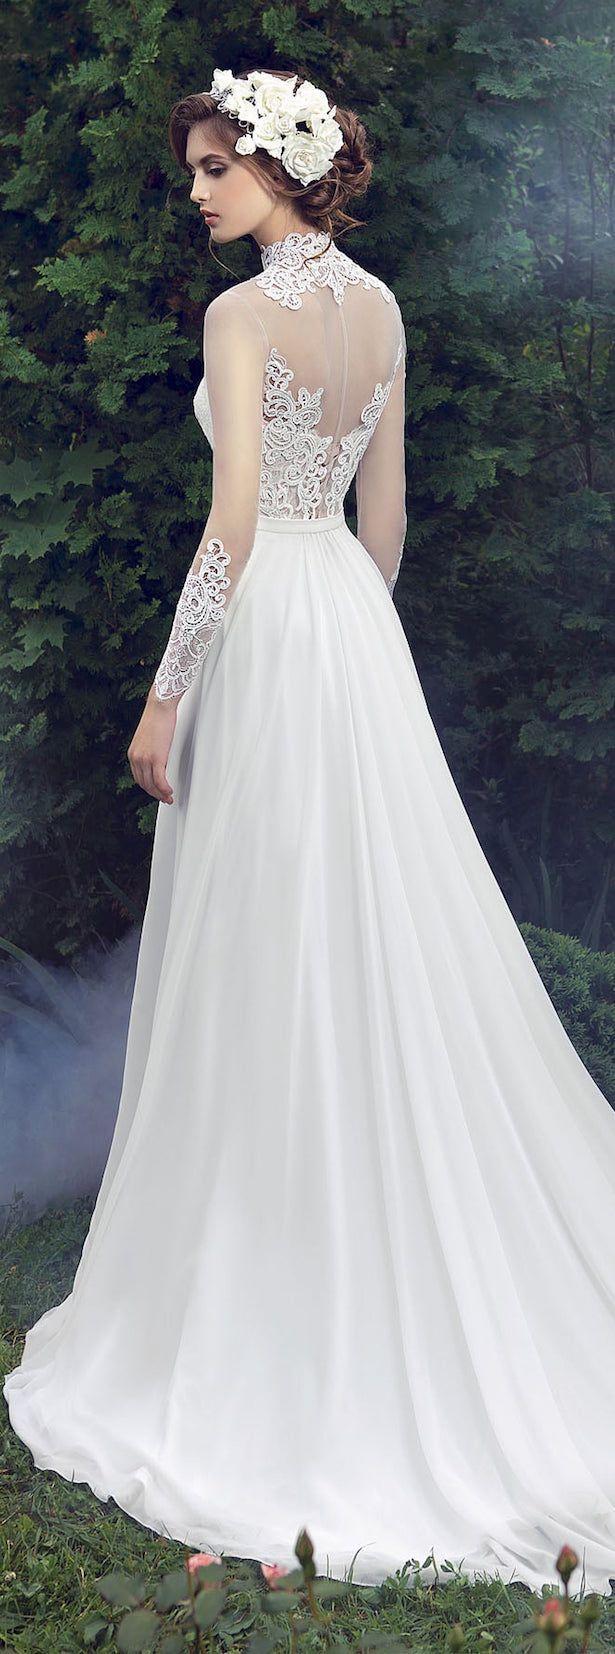 Milva 2016 Wedding Dress